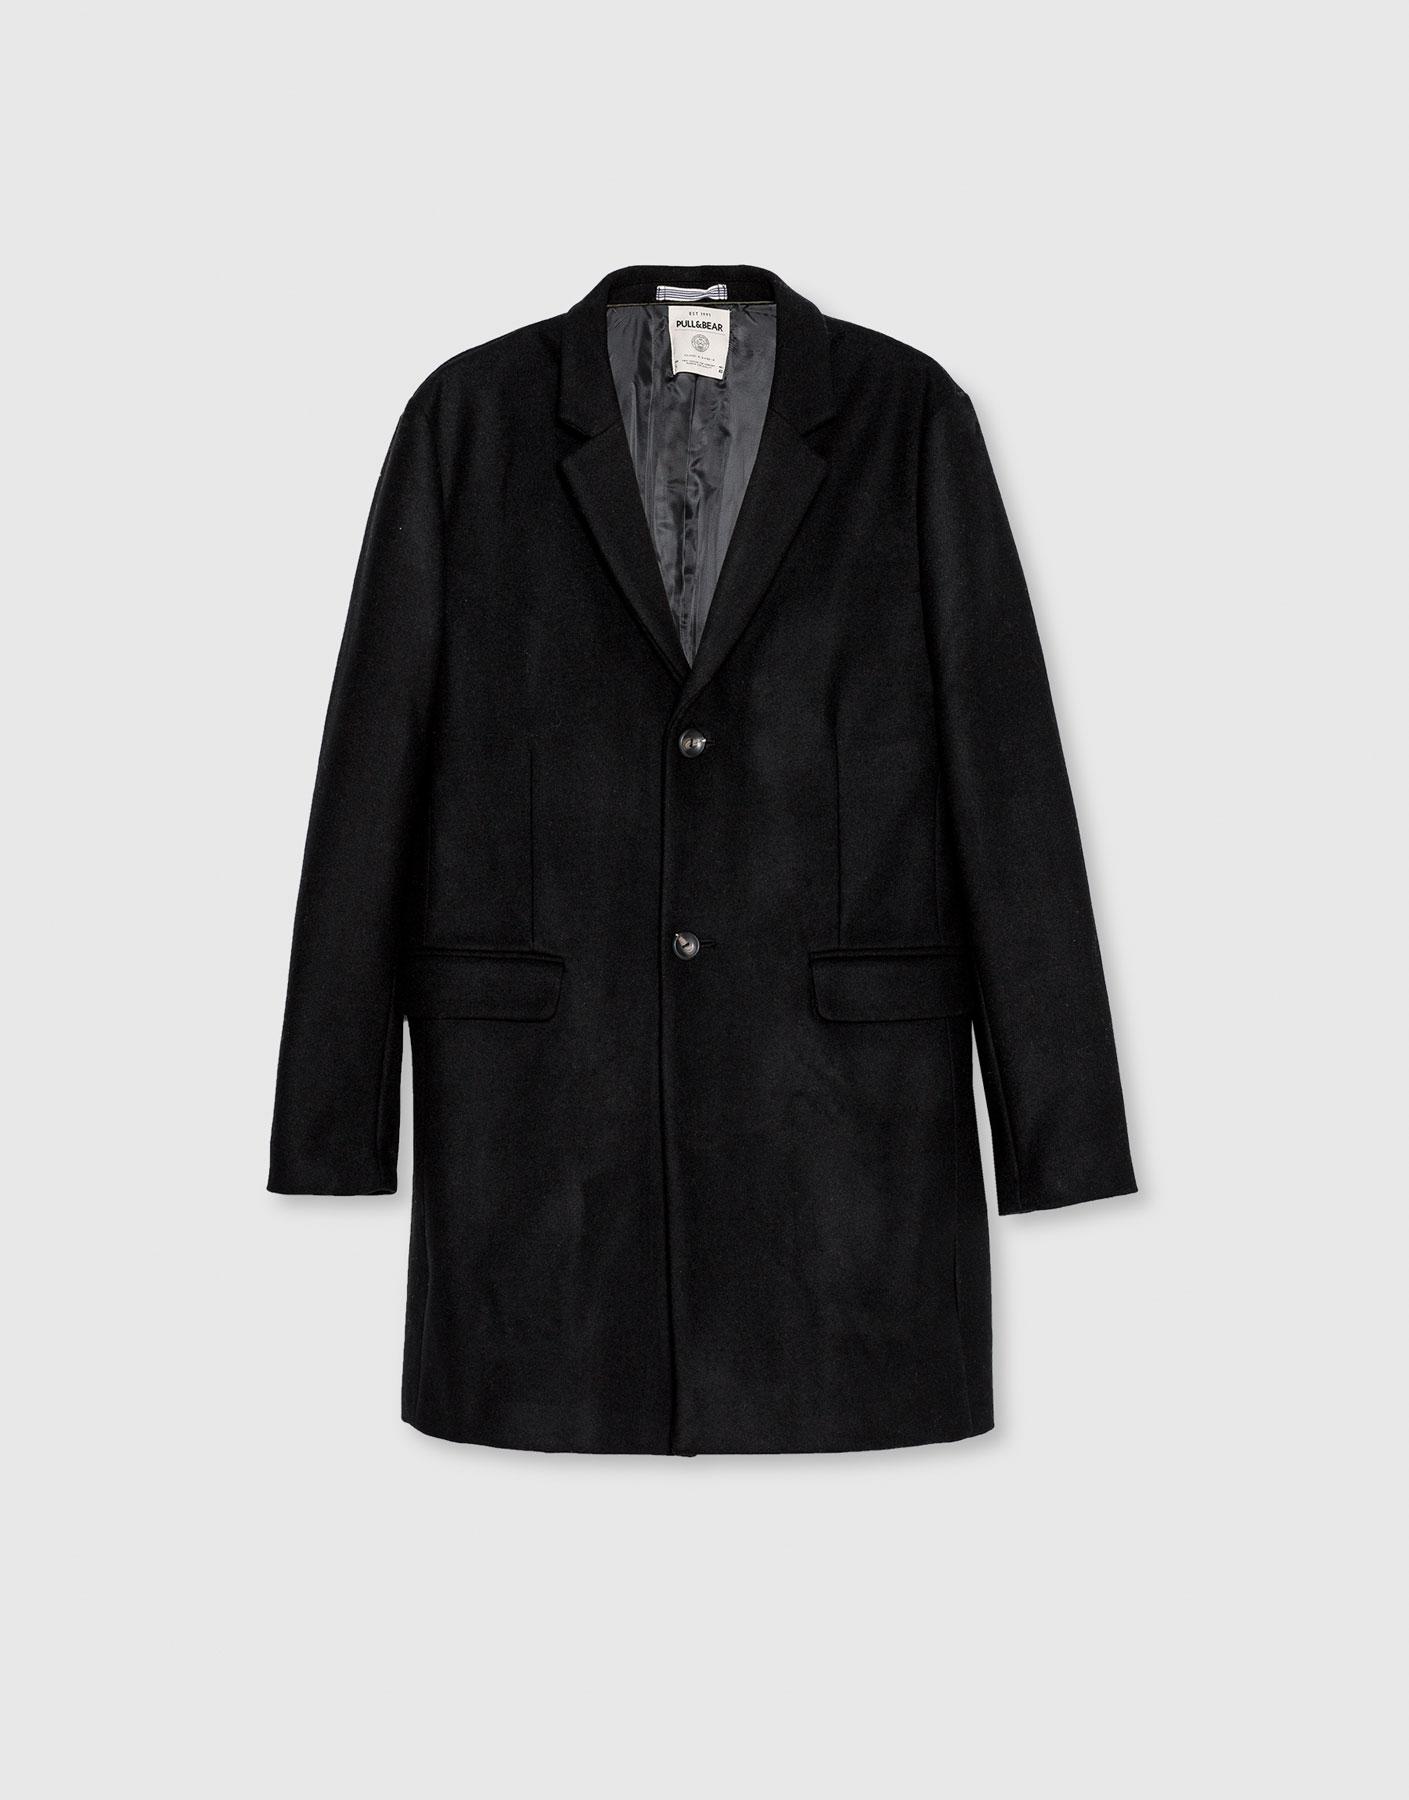 Basic wool coat, £69.99 ( pullandbear.com )